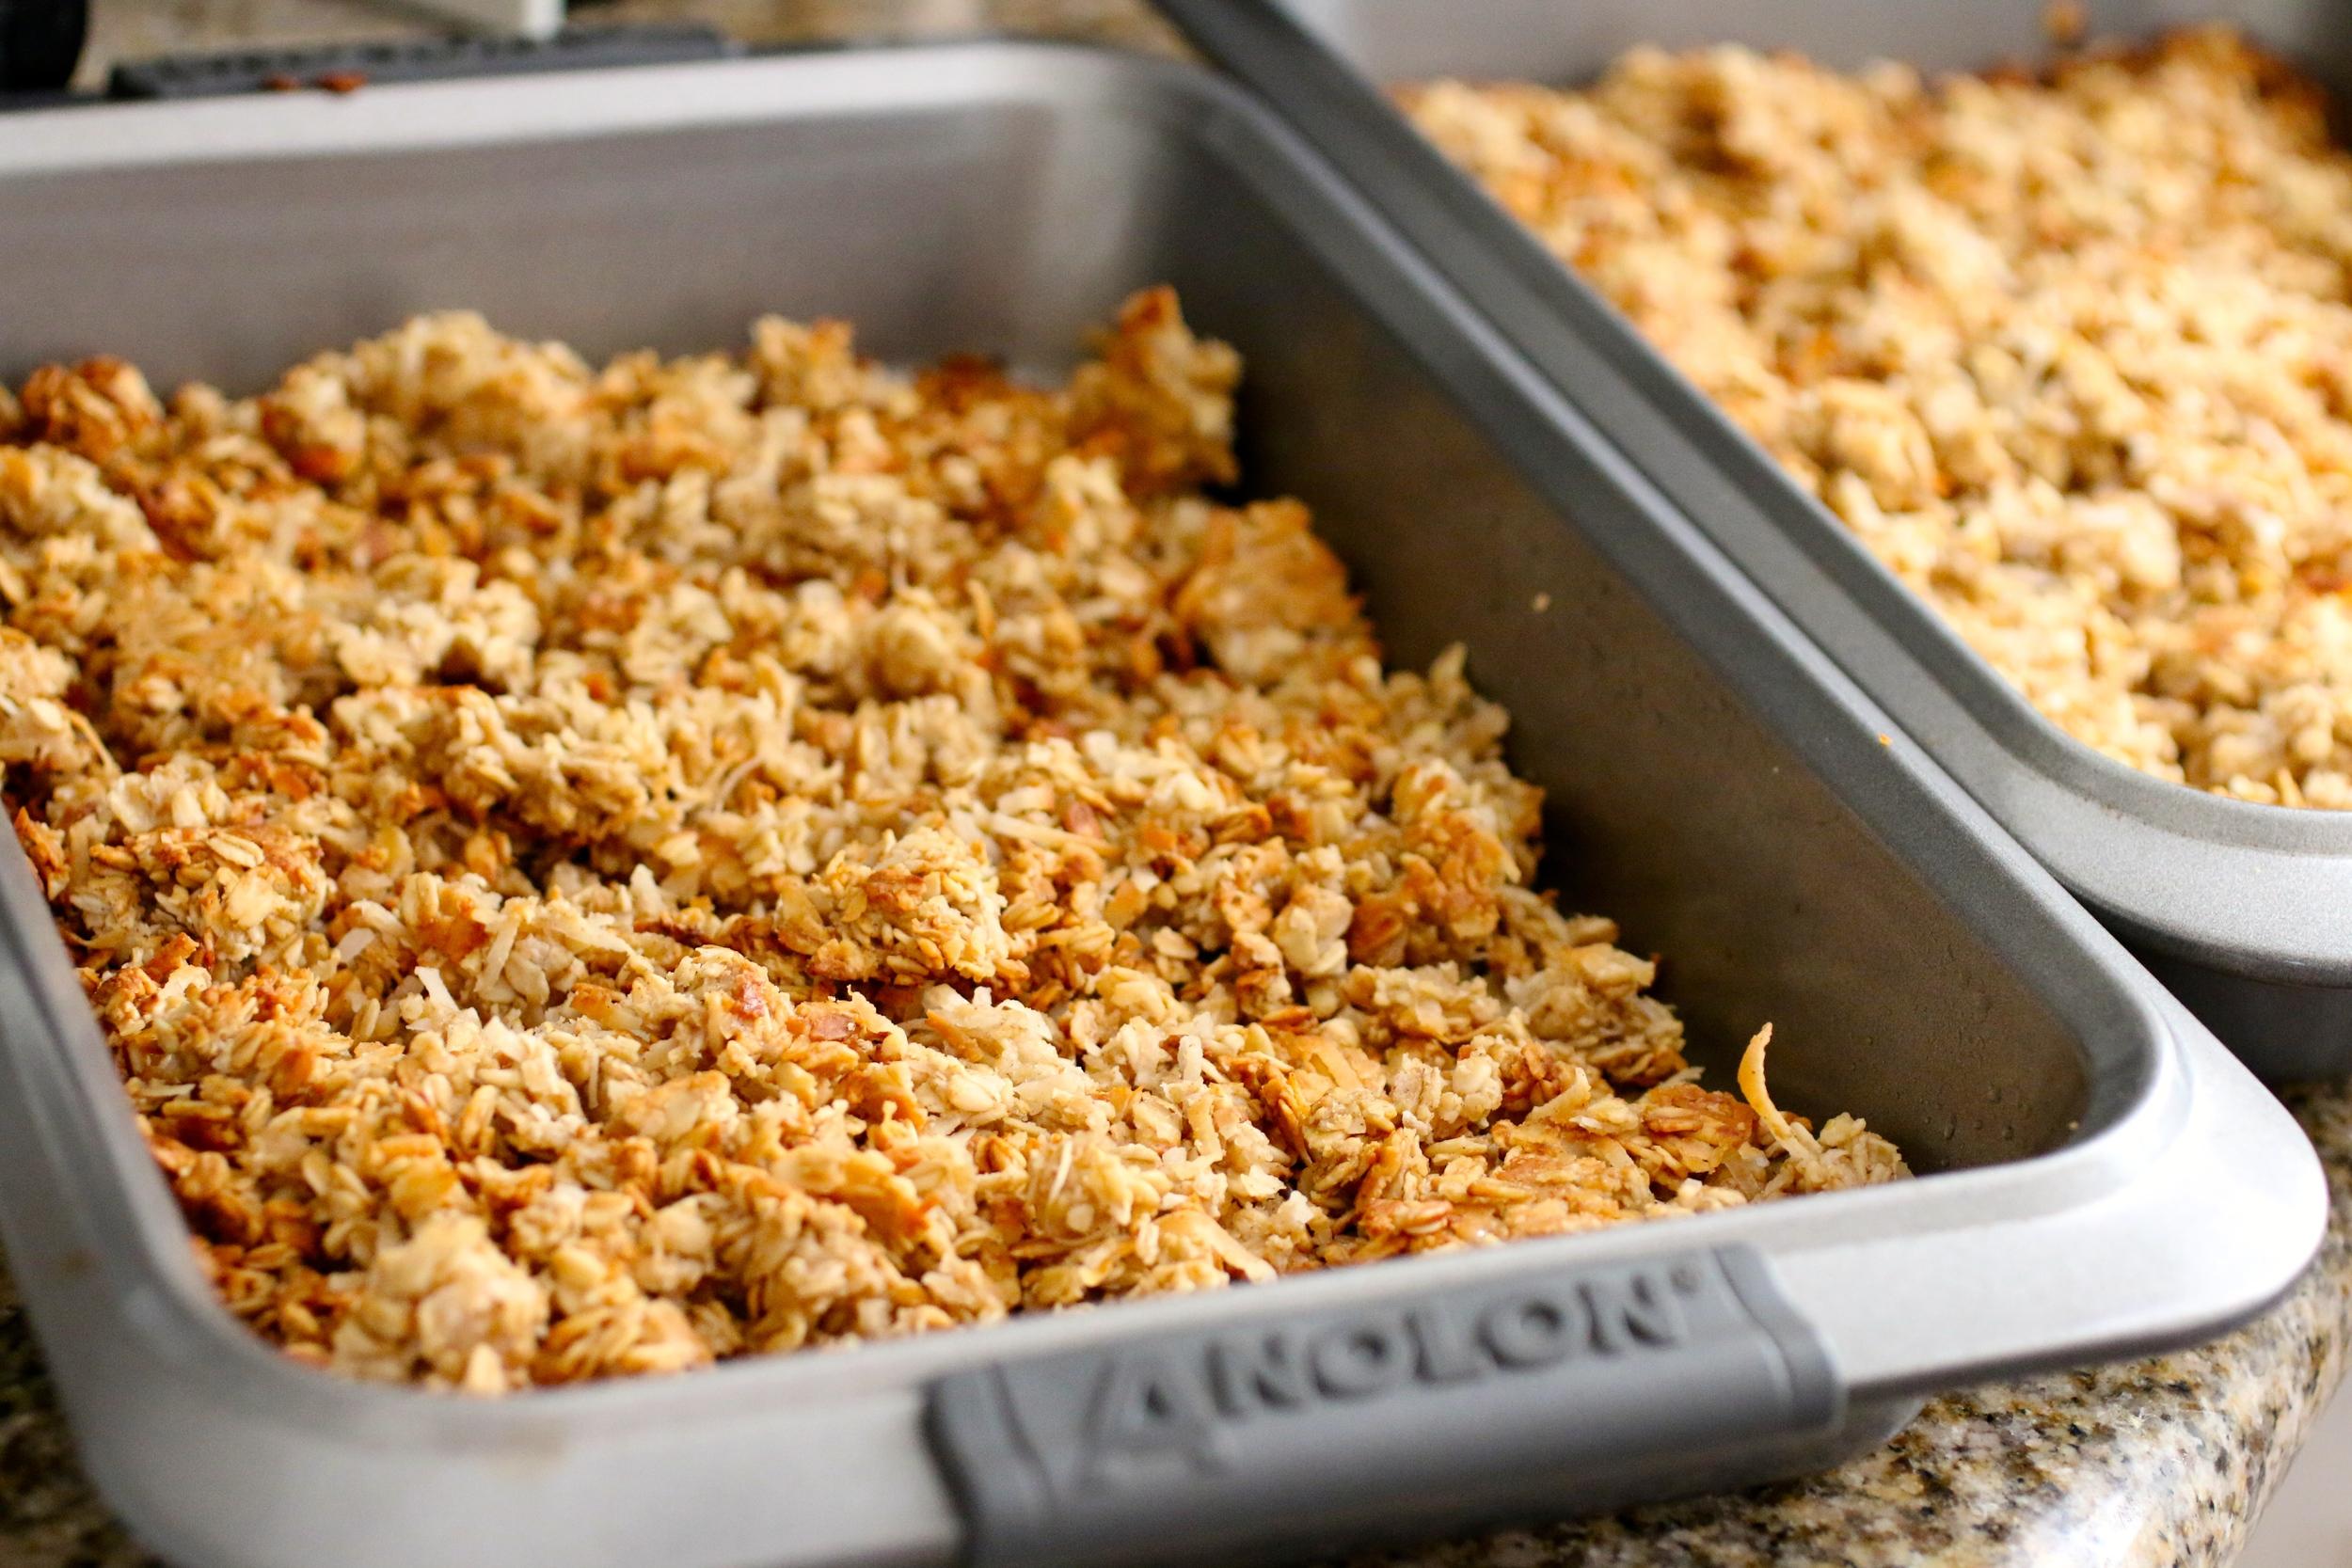 The Best Gluten Free Granola - www.barbellsandbaking.com